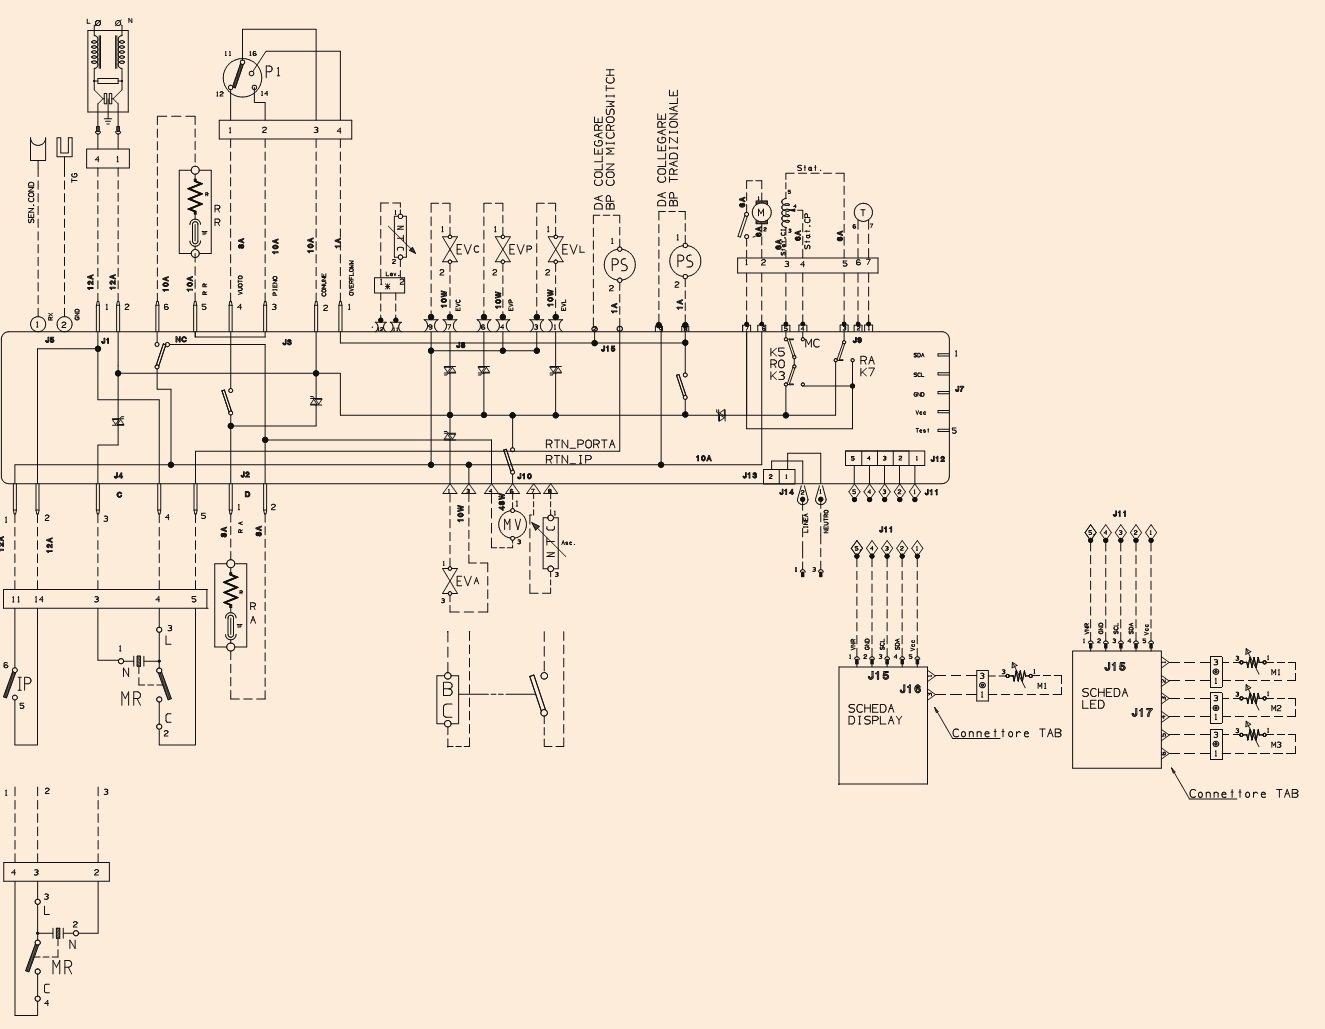 hobart oven wiring diagram  hobart  free engine image for